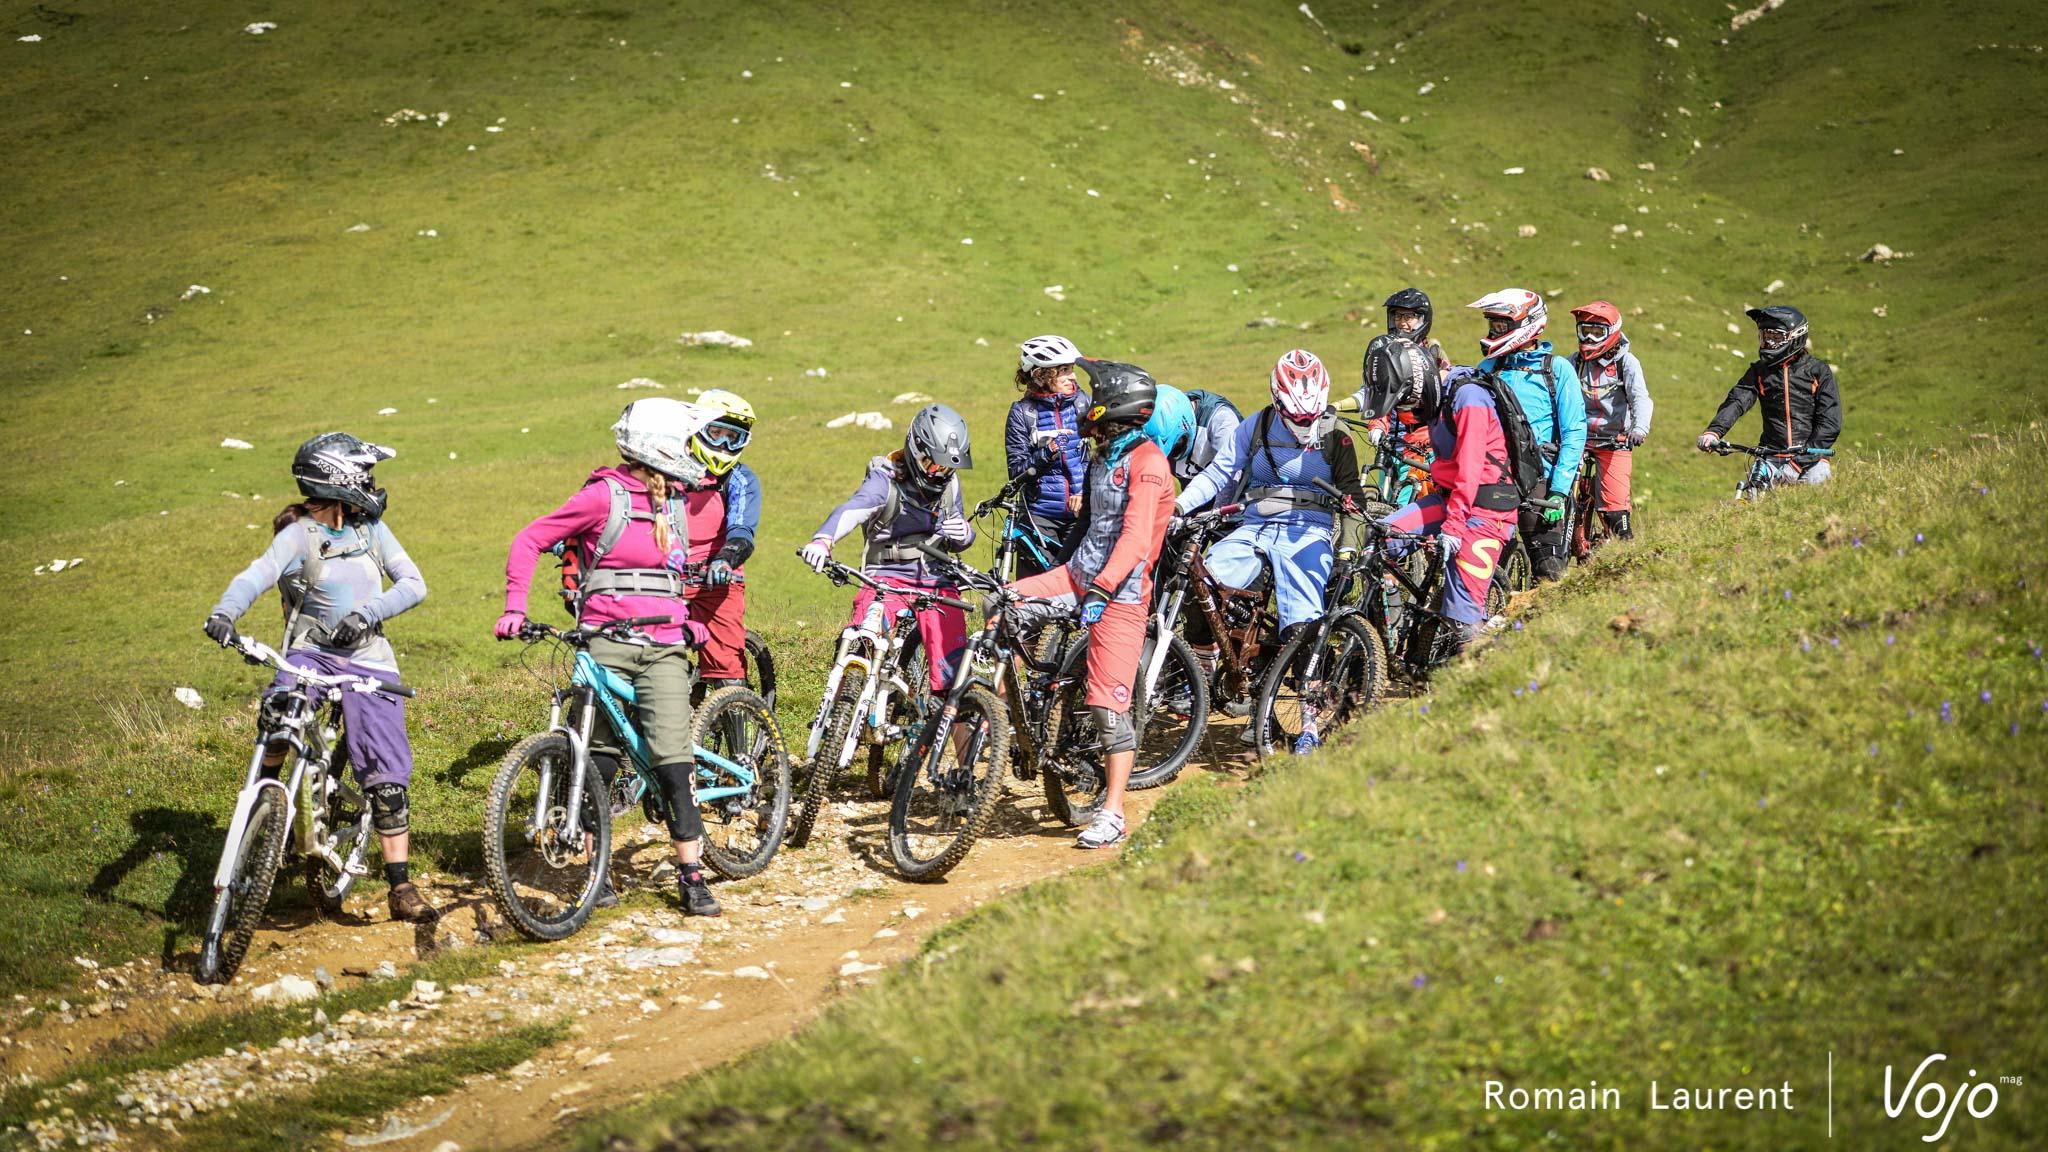 les_bikettes_journee_chatons_tignes_2016_vojo